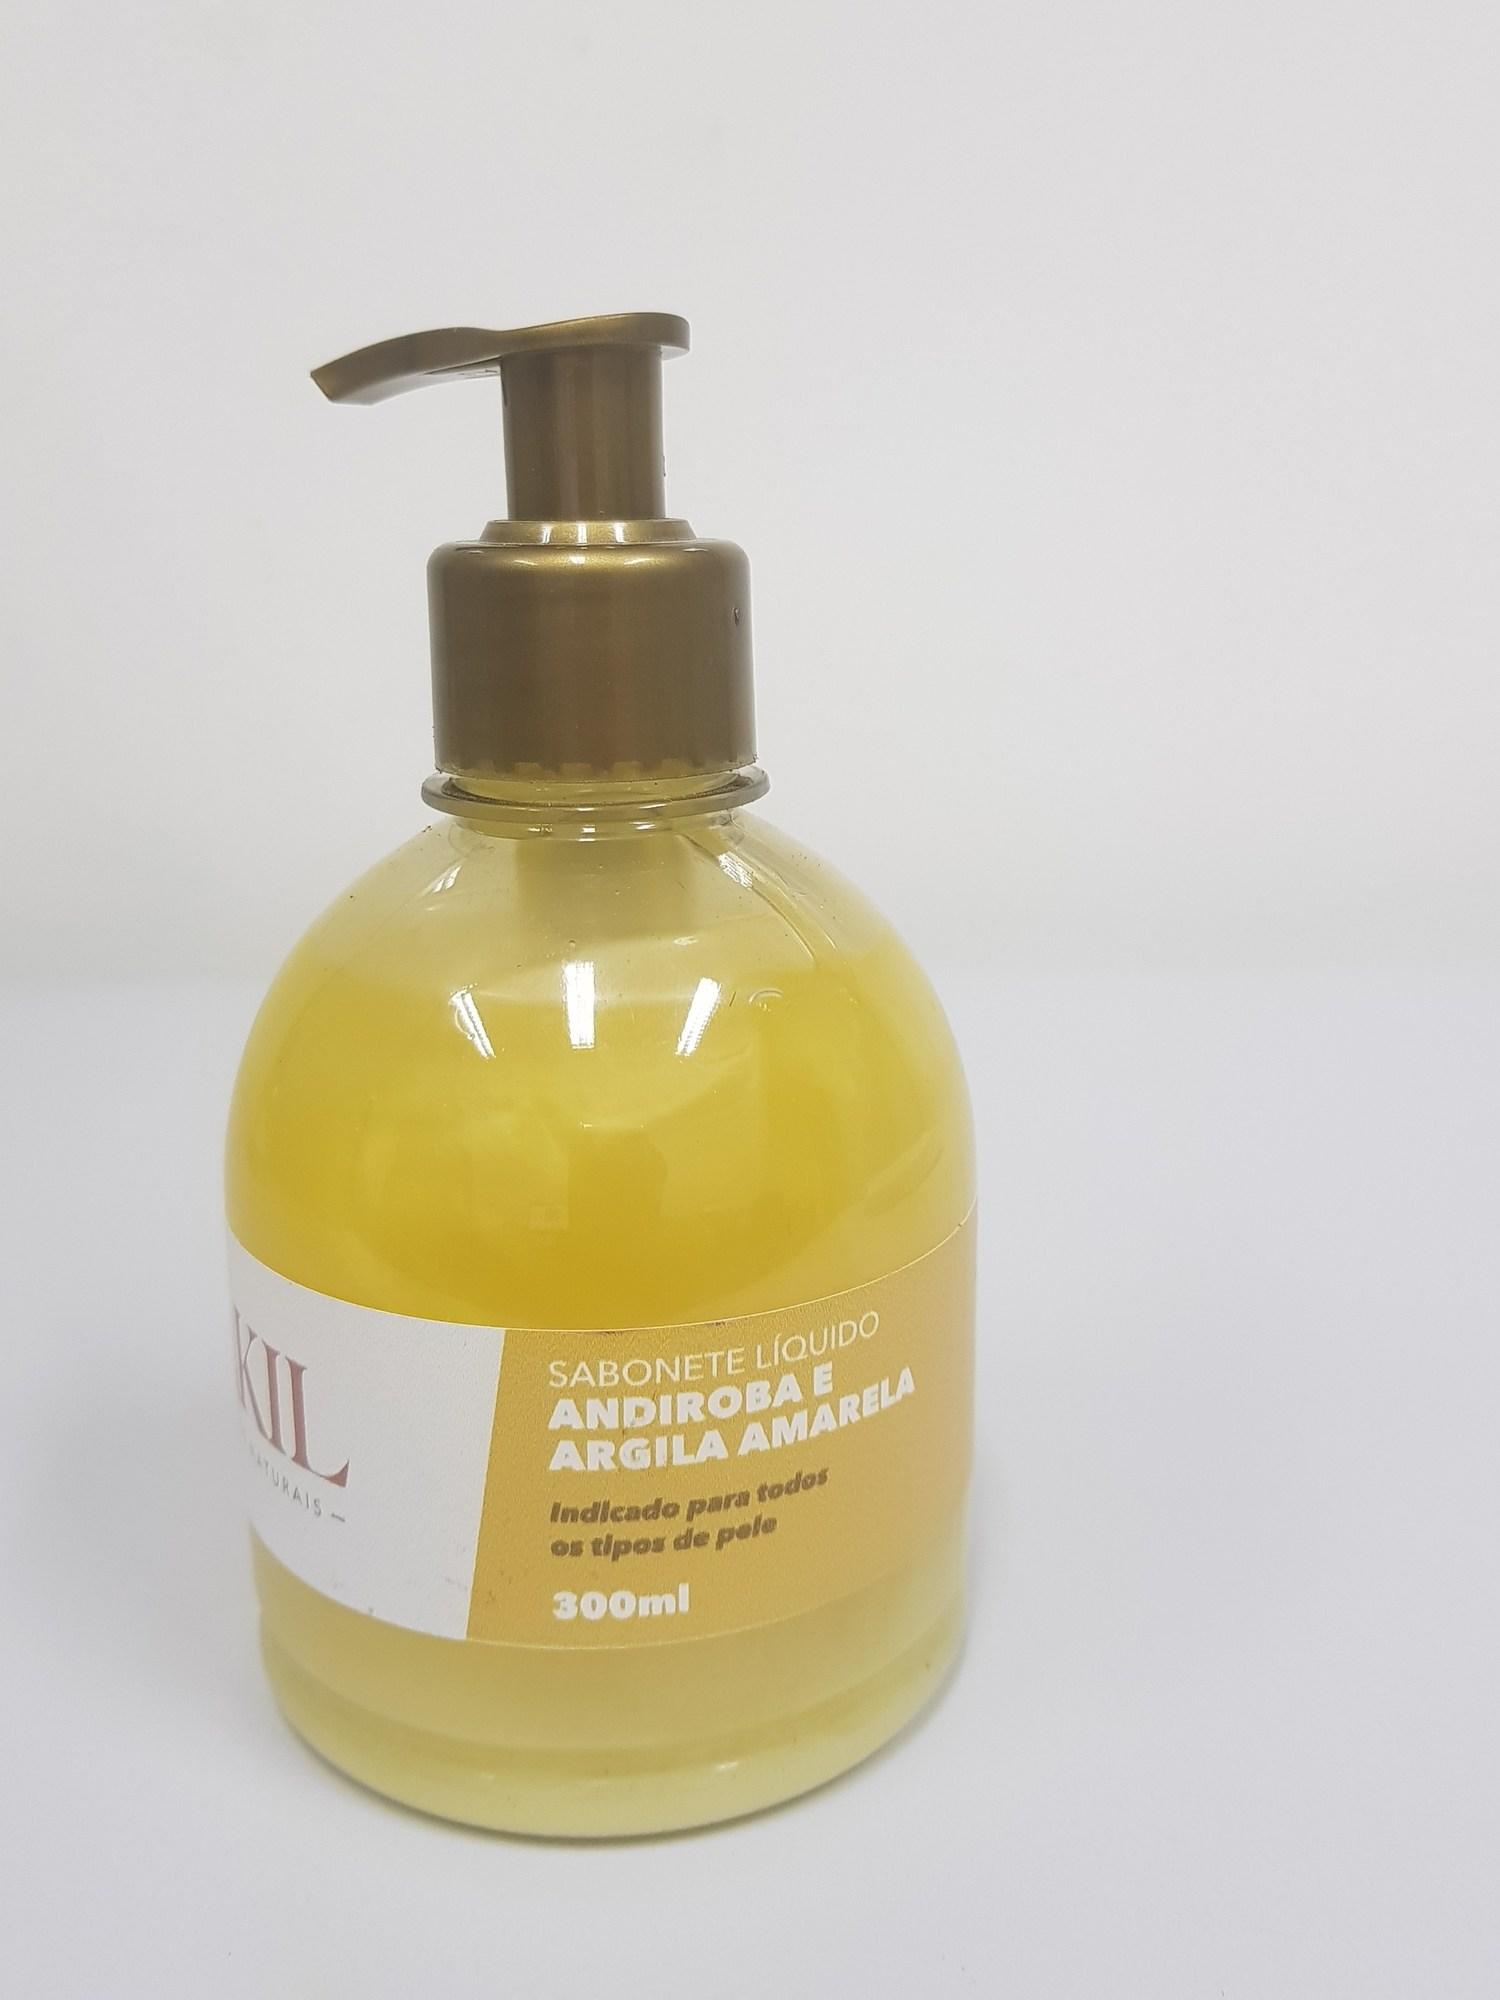 SABONETE LÍQUIDO ARGILA AMARELA ÓLEO DE ANDIROBA 300 ml